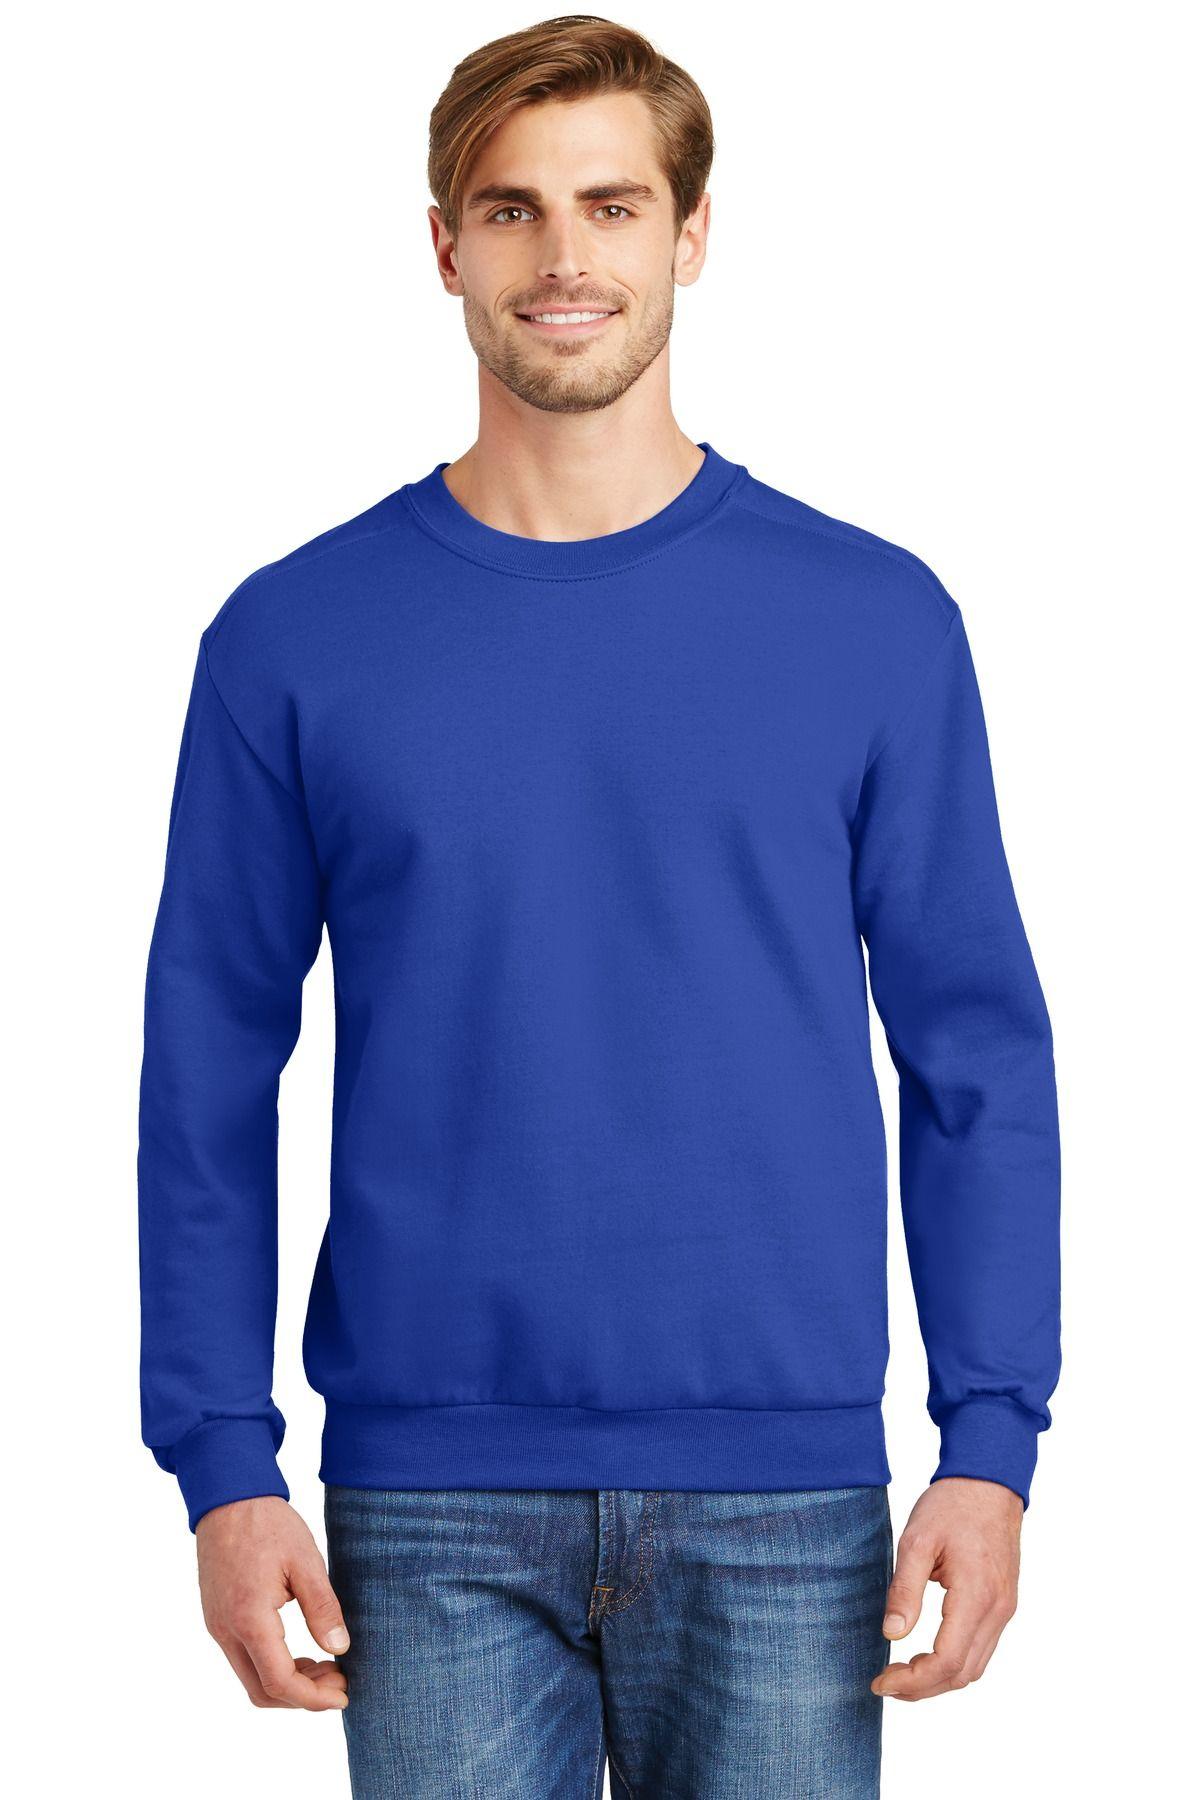 Anvil Crewneck Sweatshirt 71000 Information • 7.2ounce